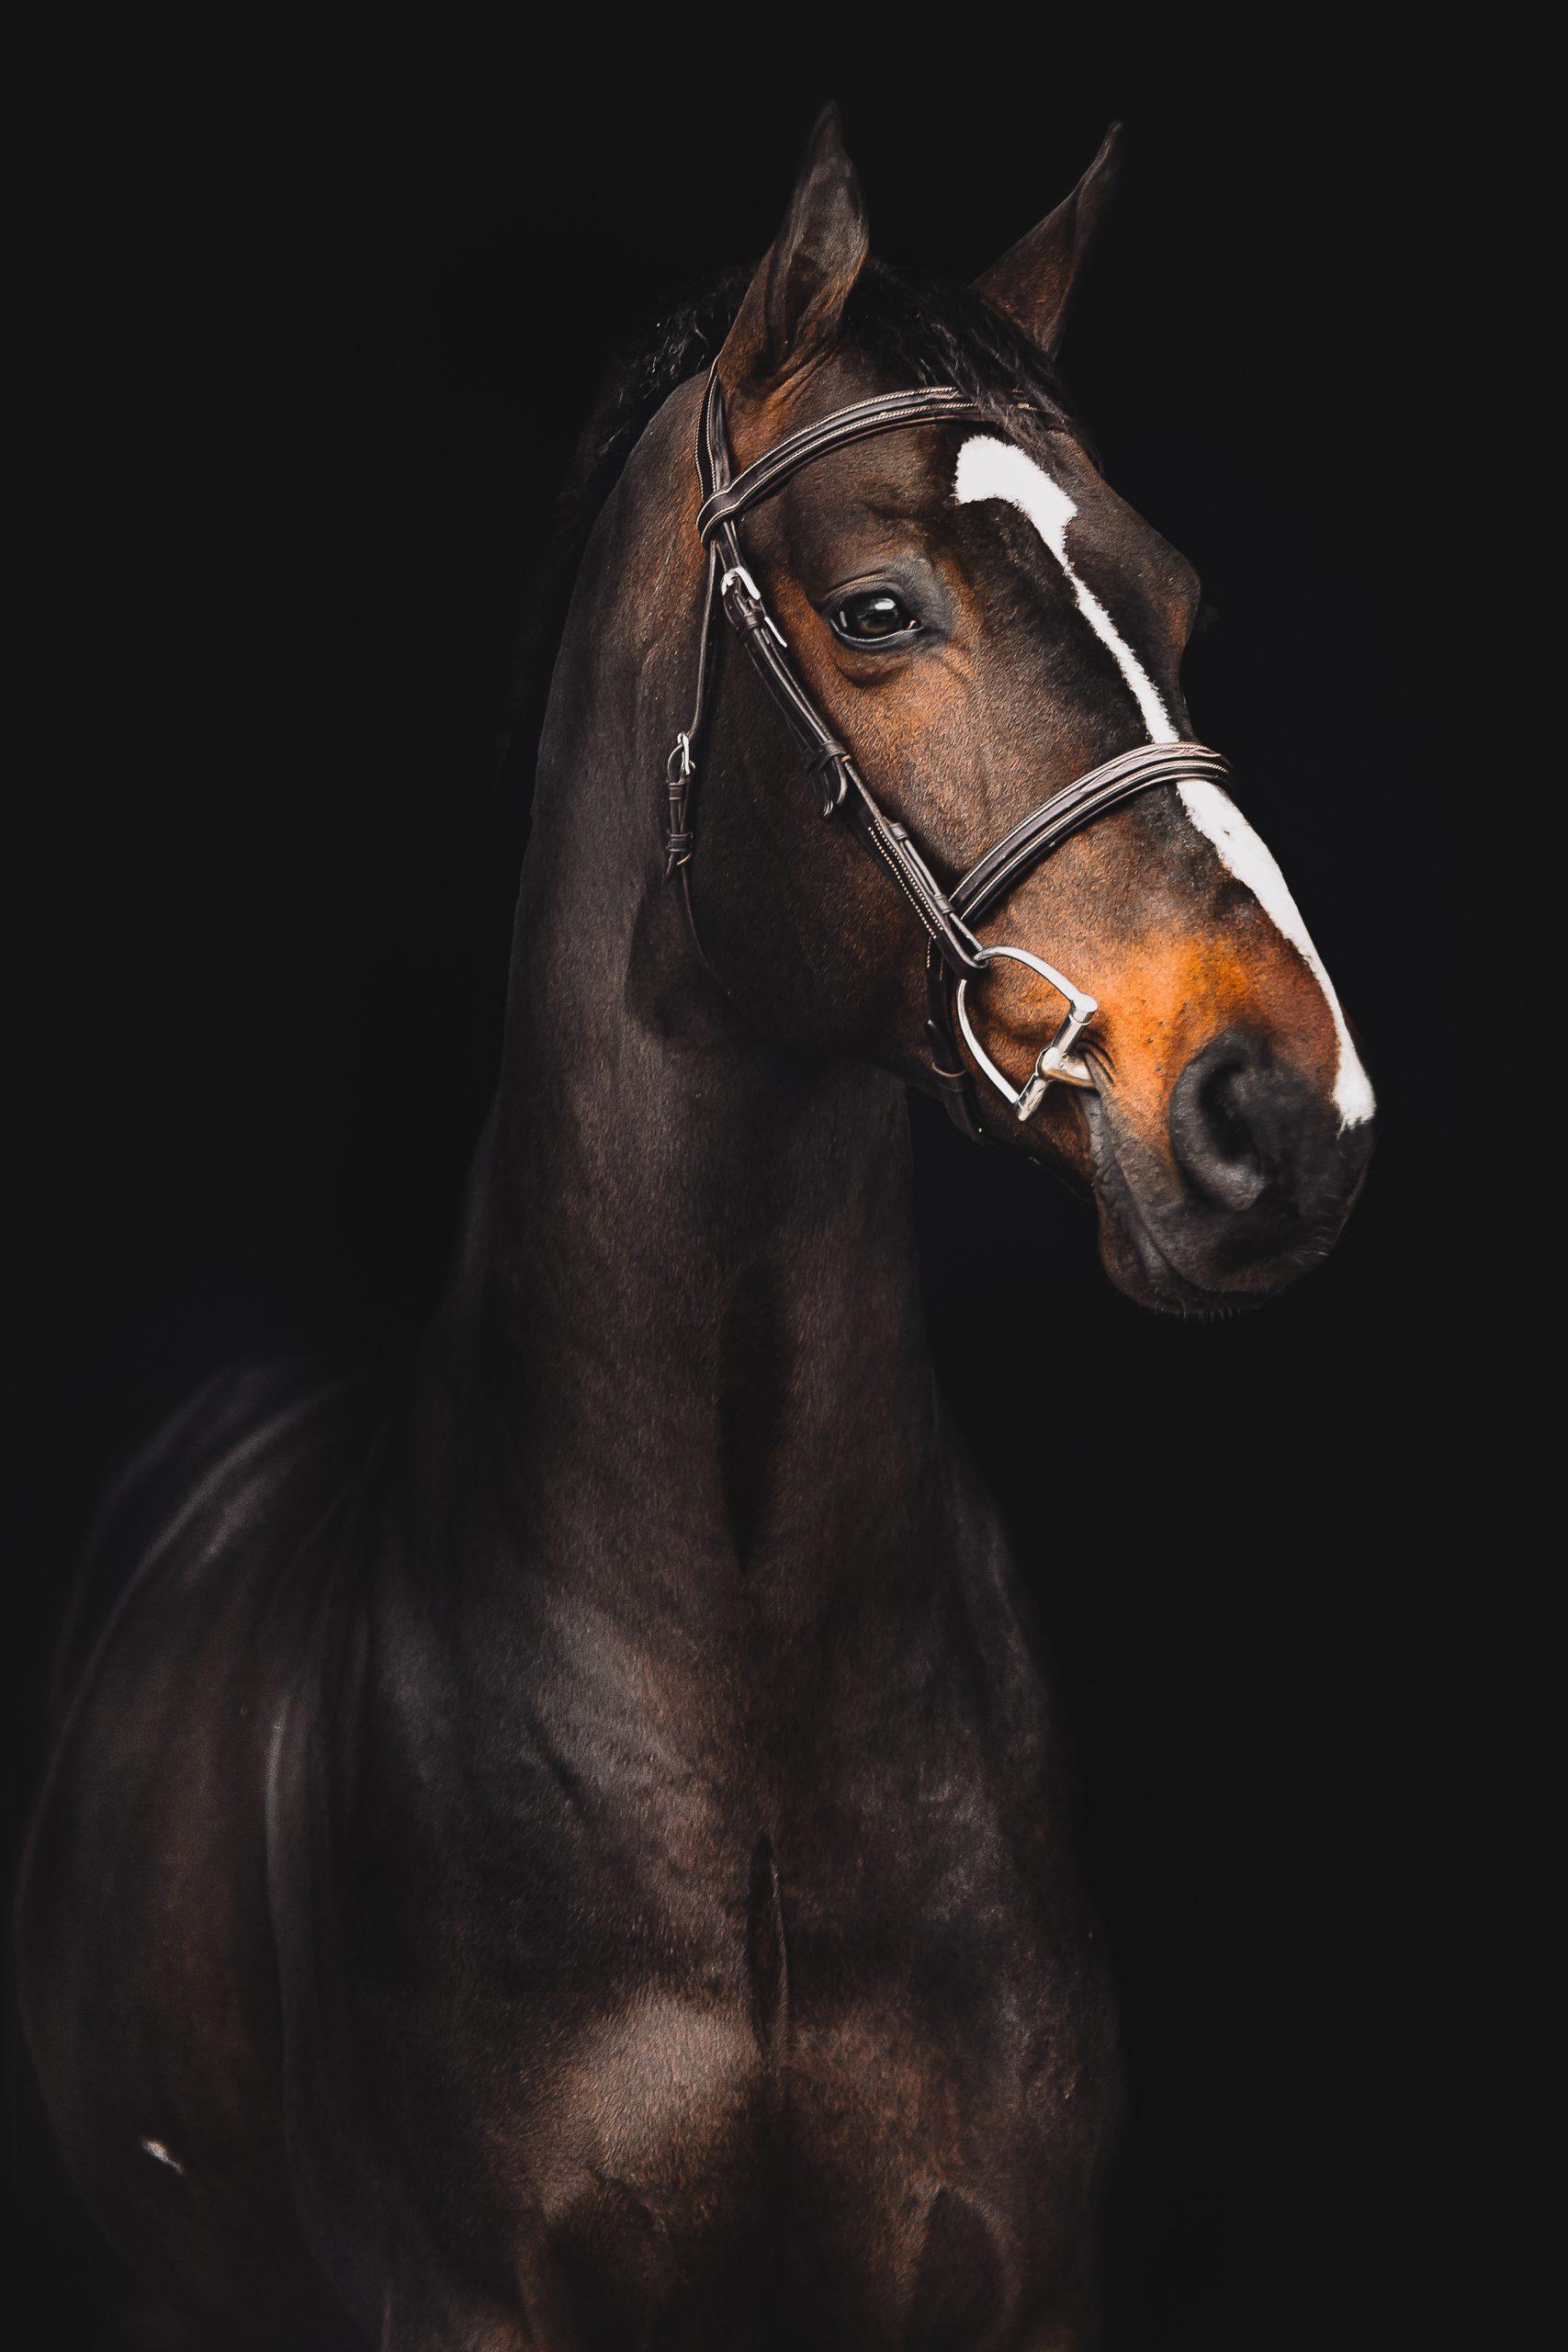 black background equine